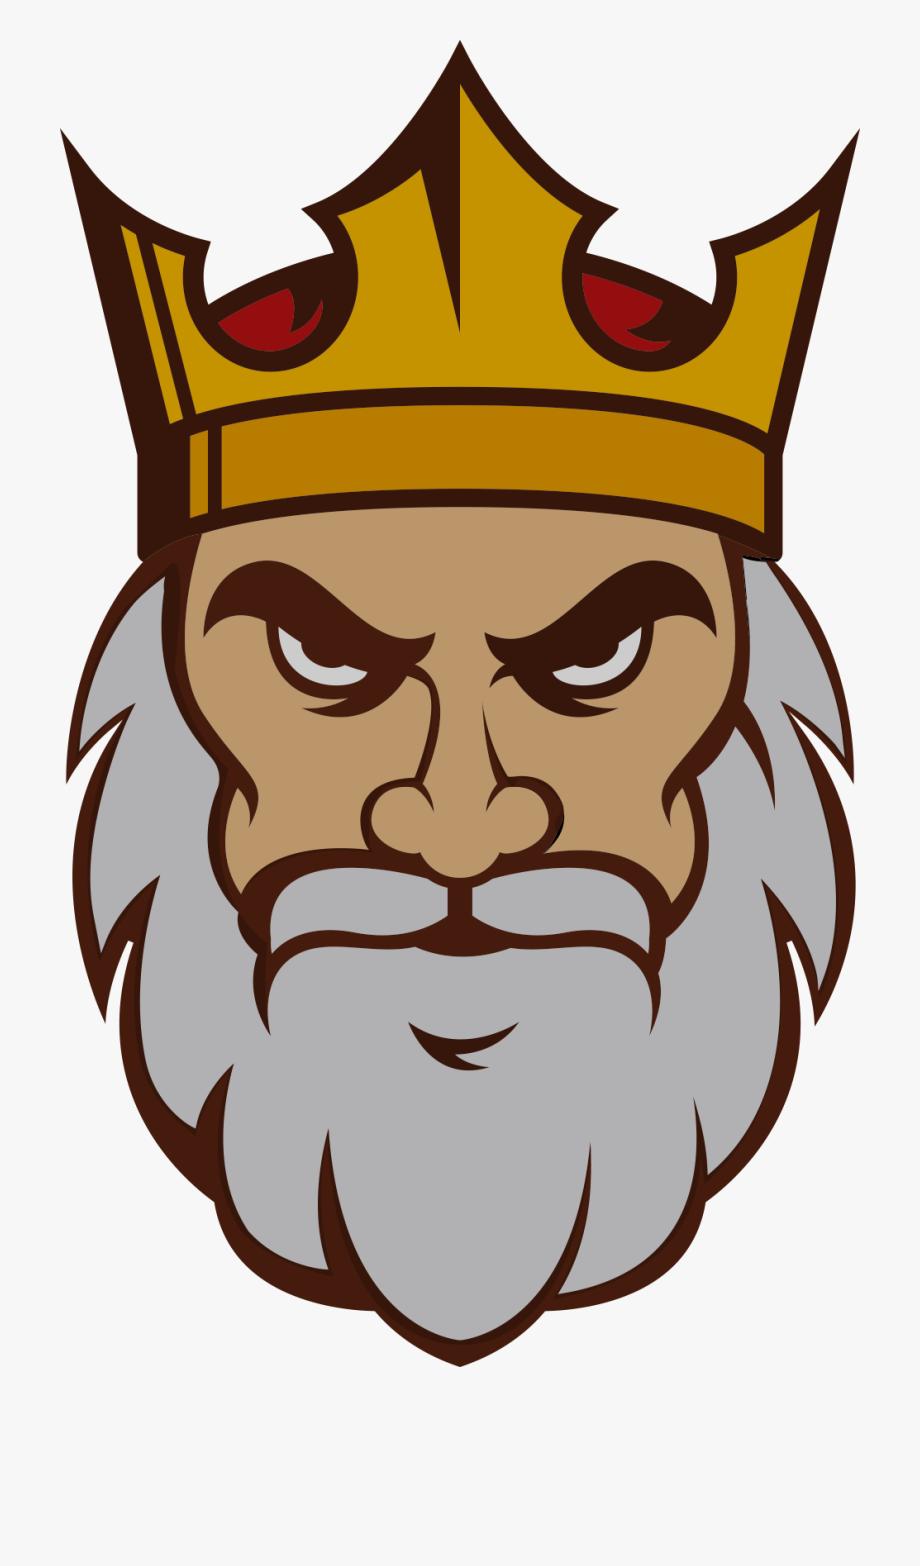 Png cliparts cartoons jing. King clipart face king